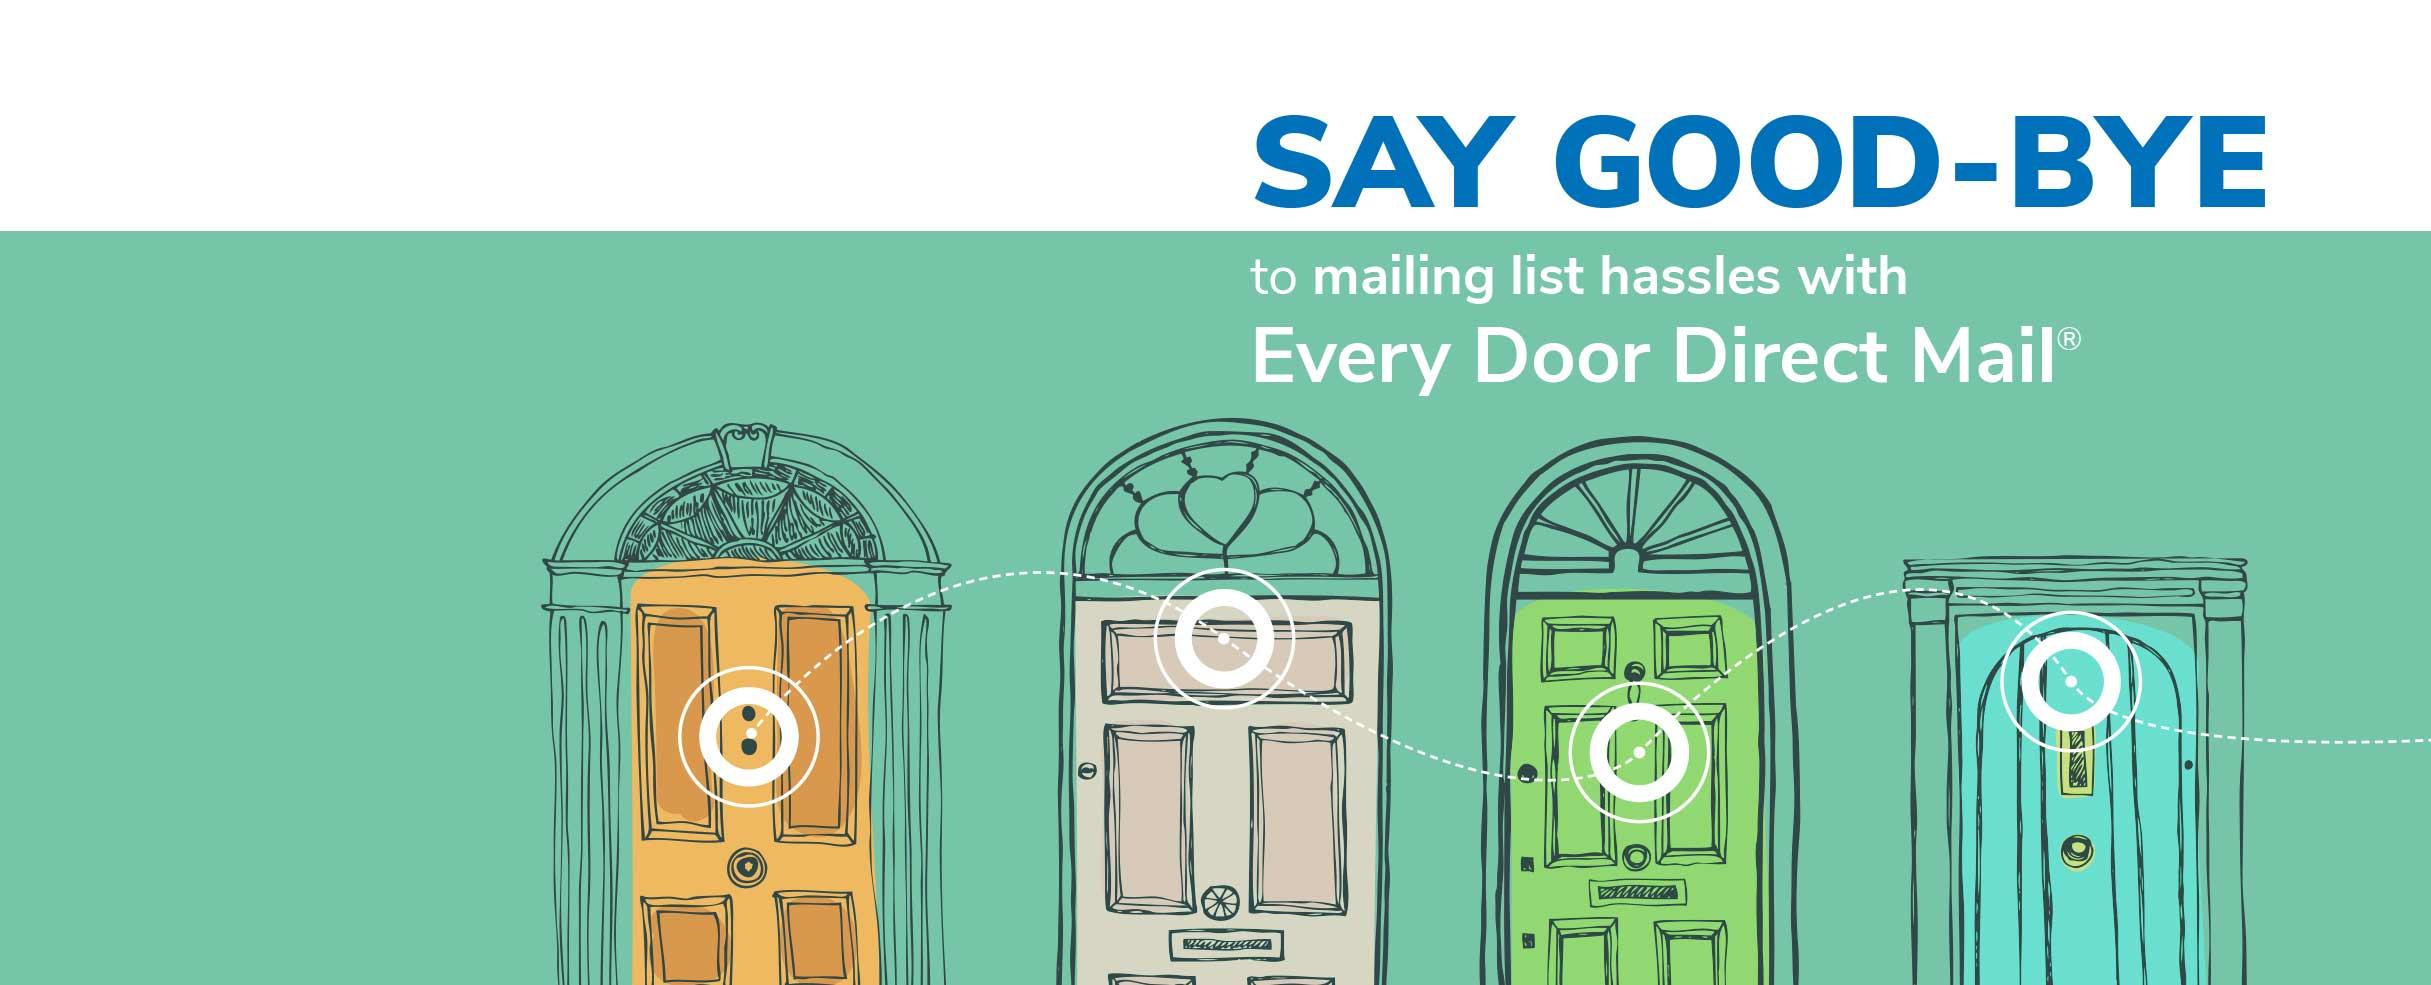 Every Door Direct Mail®